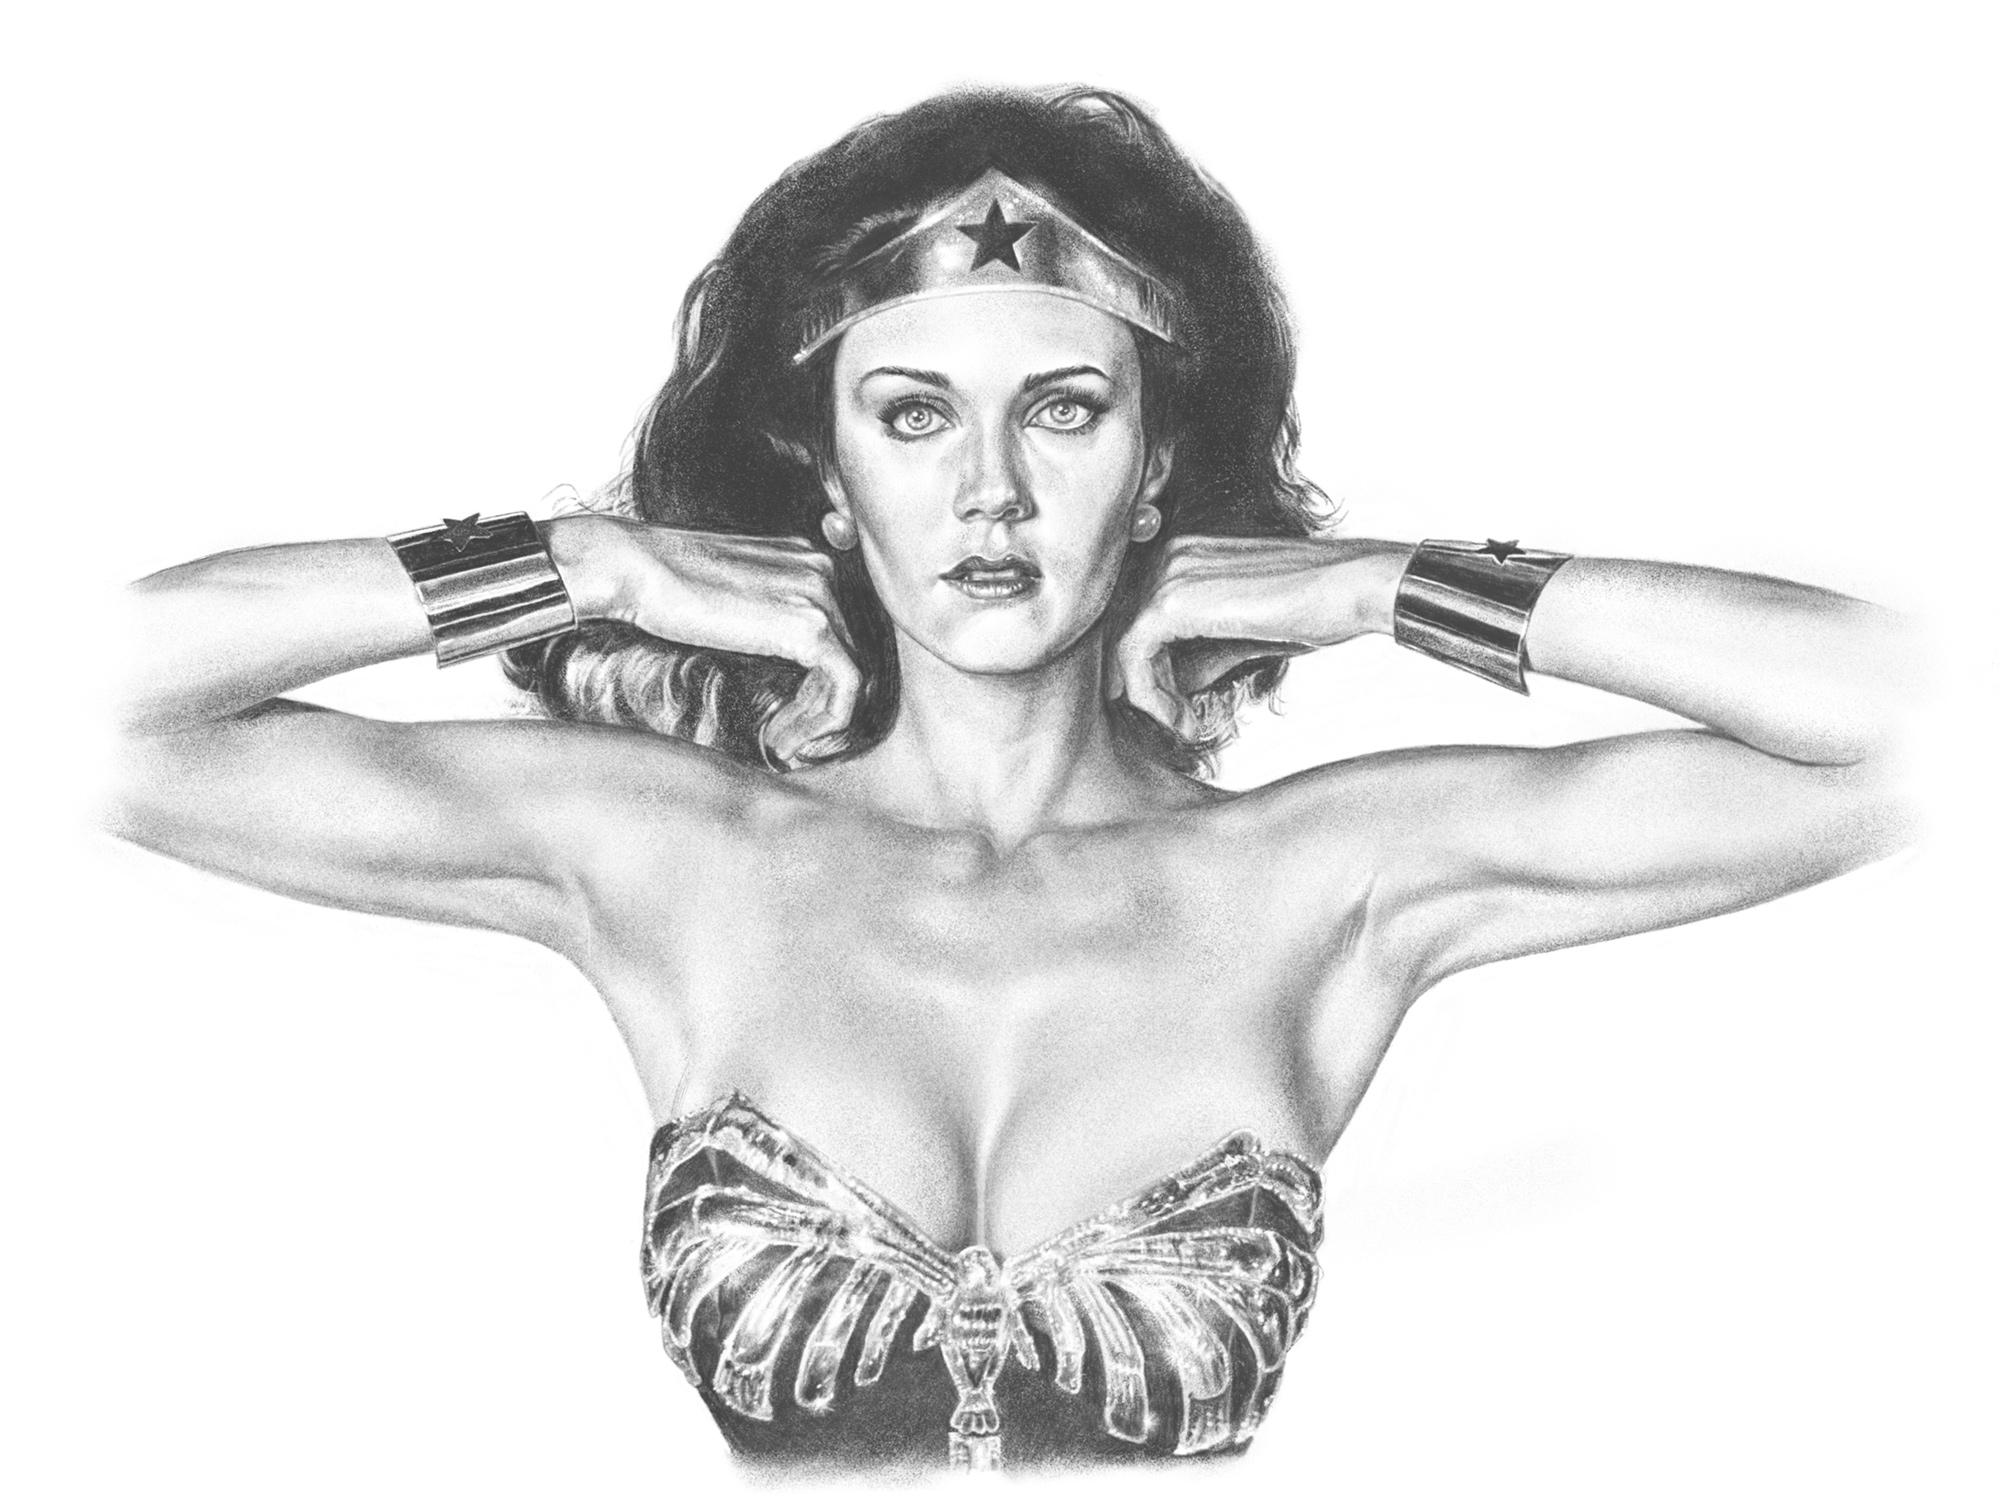 Lynda Carter As Wonder Woman, 2016